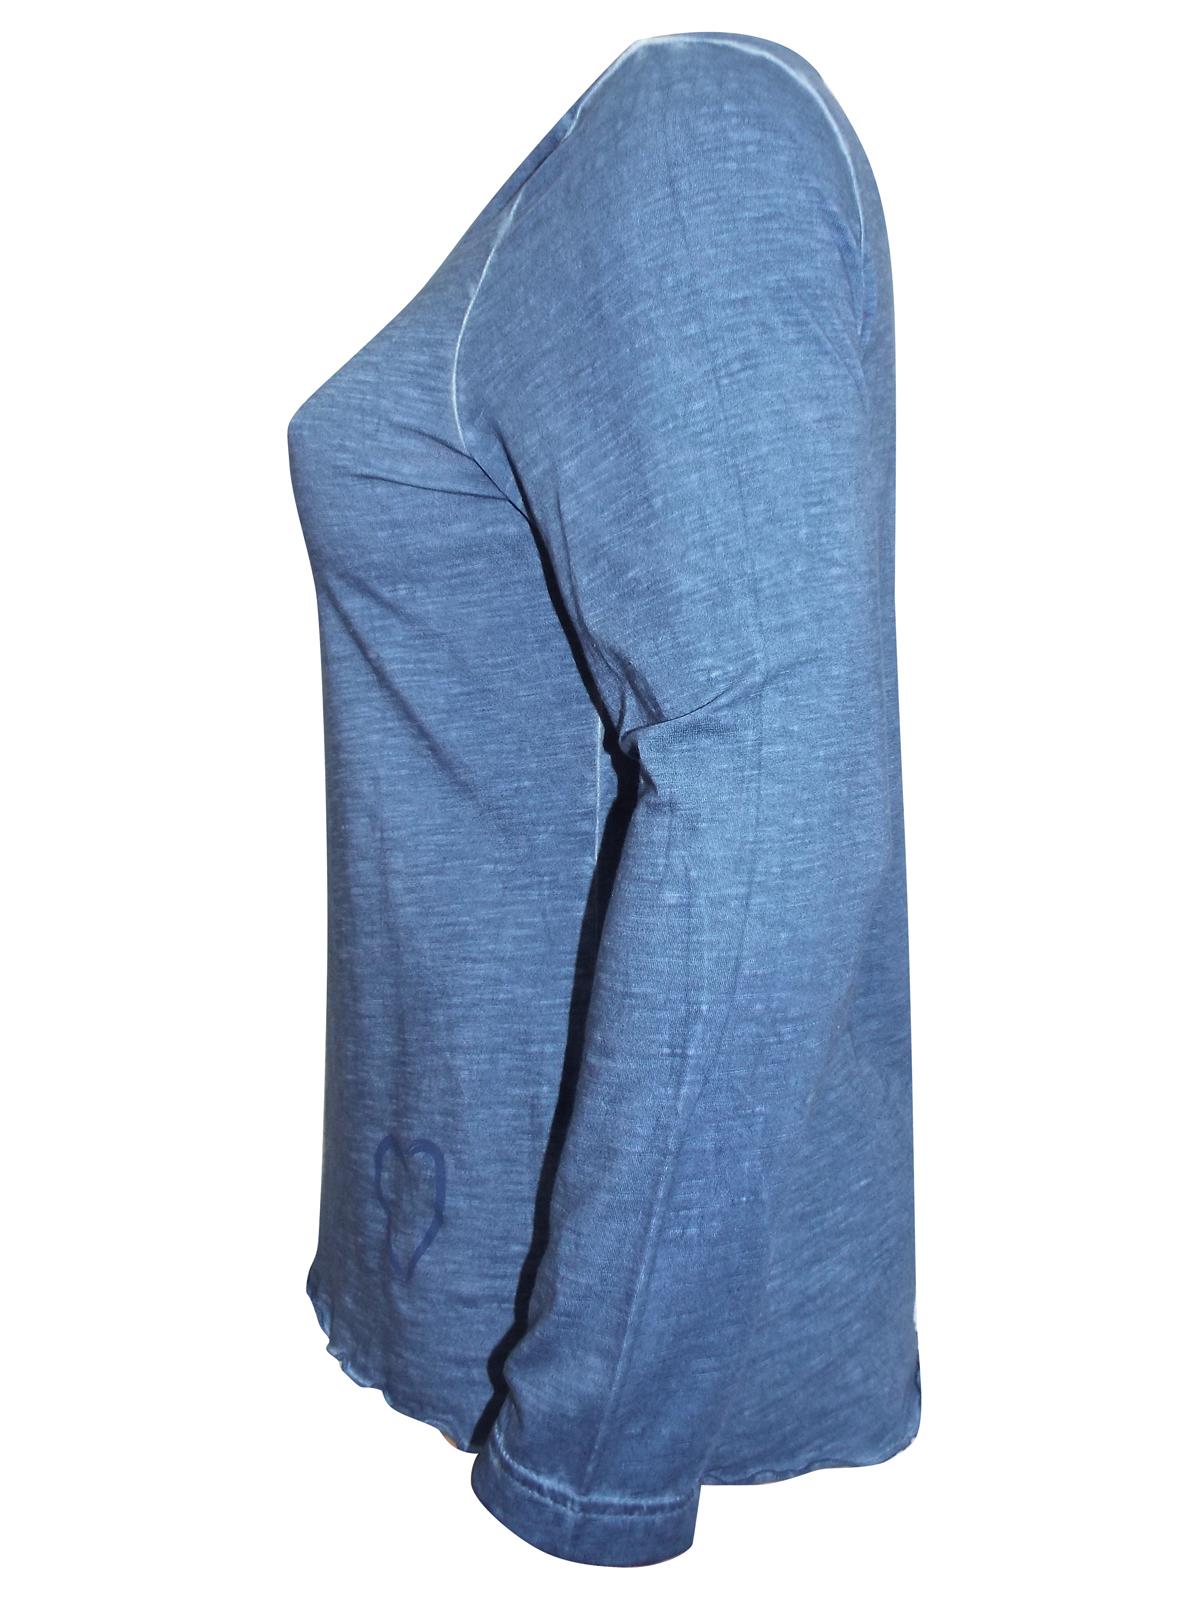 Sheego jersey cotton long sleeve oil wash light green top heart on hem plus size